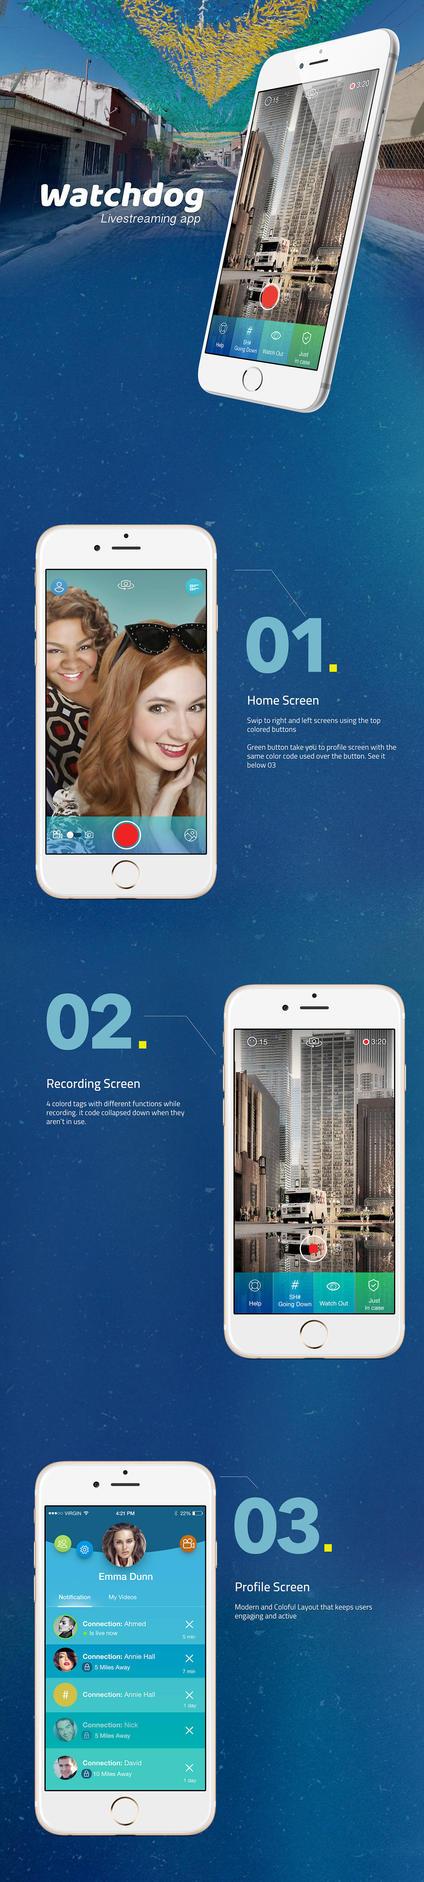 Live-streaming mobile app by ahmedzahran